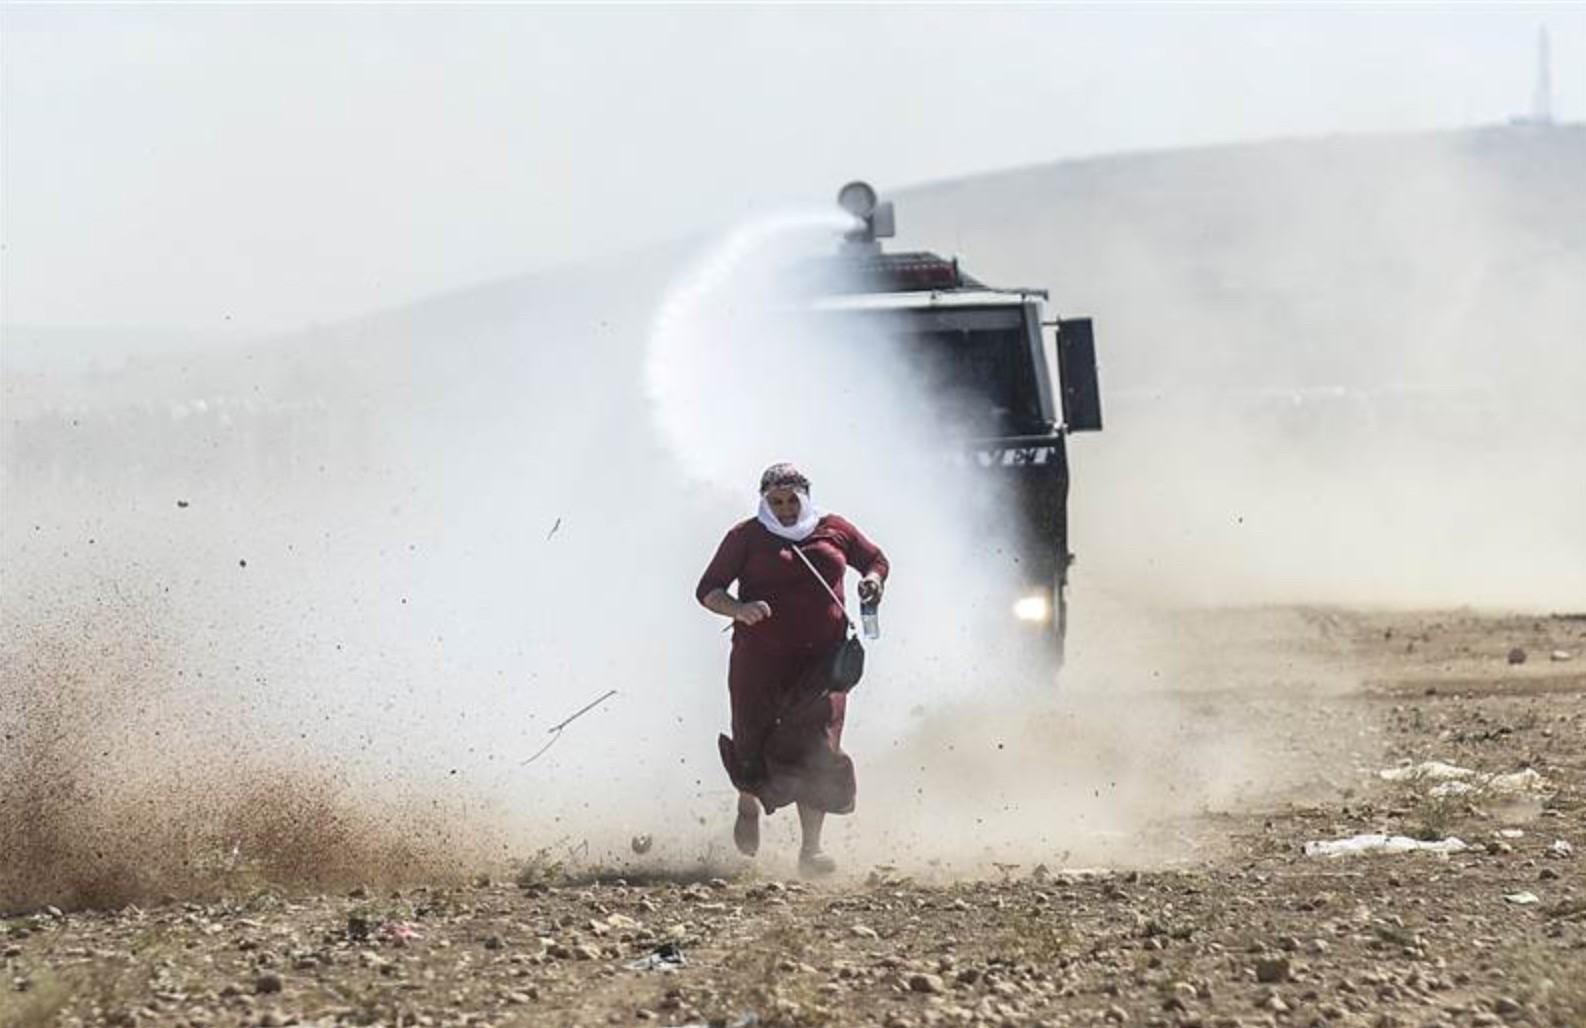 A Kurdish woman runs away from a water cannon near the Syrian border.